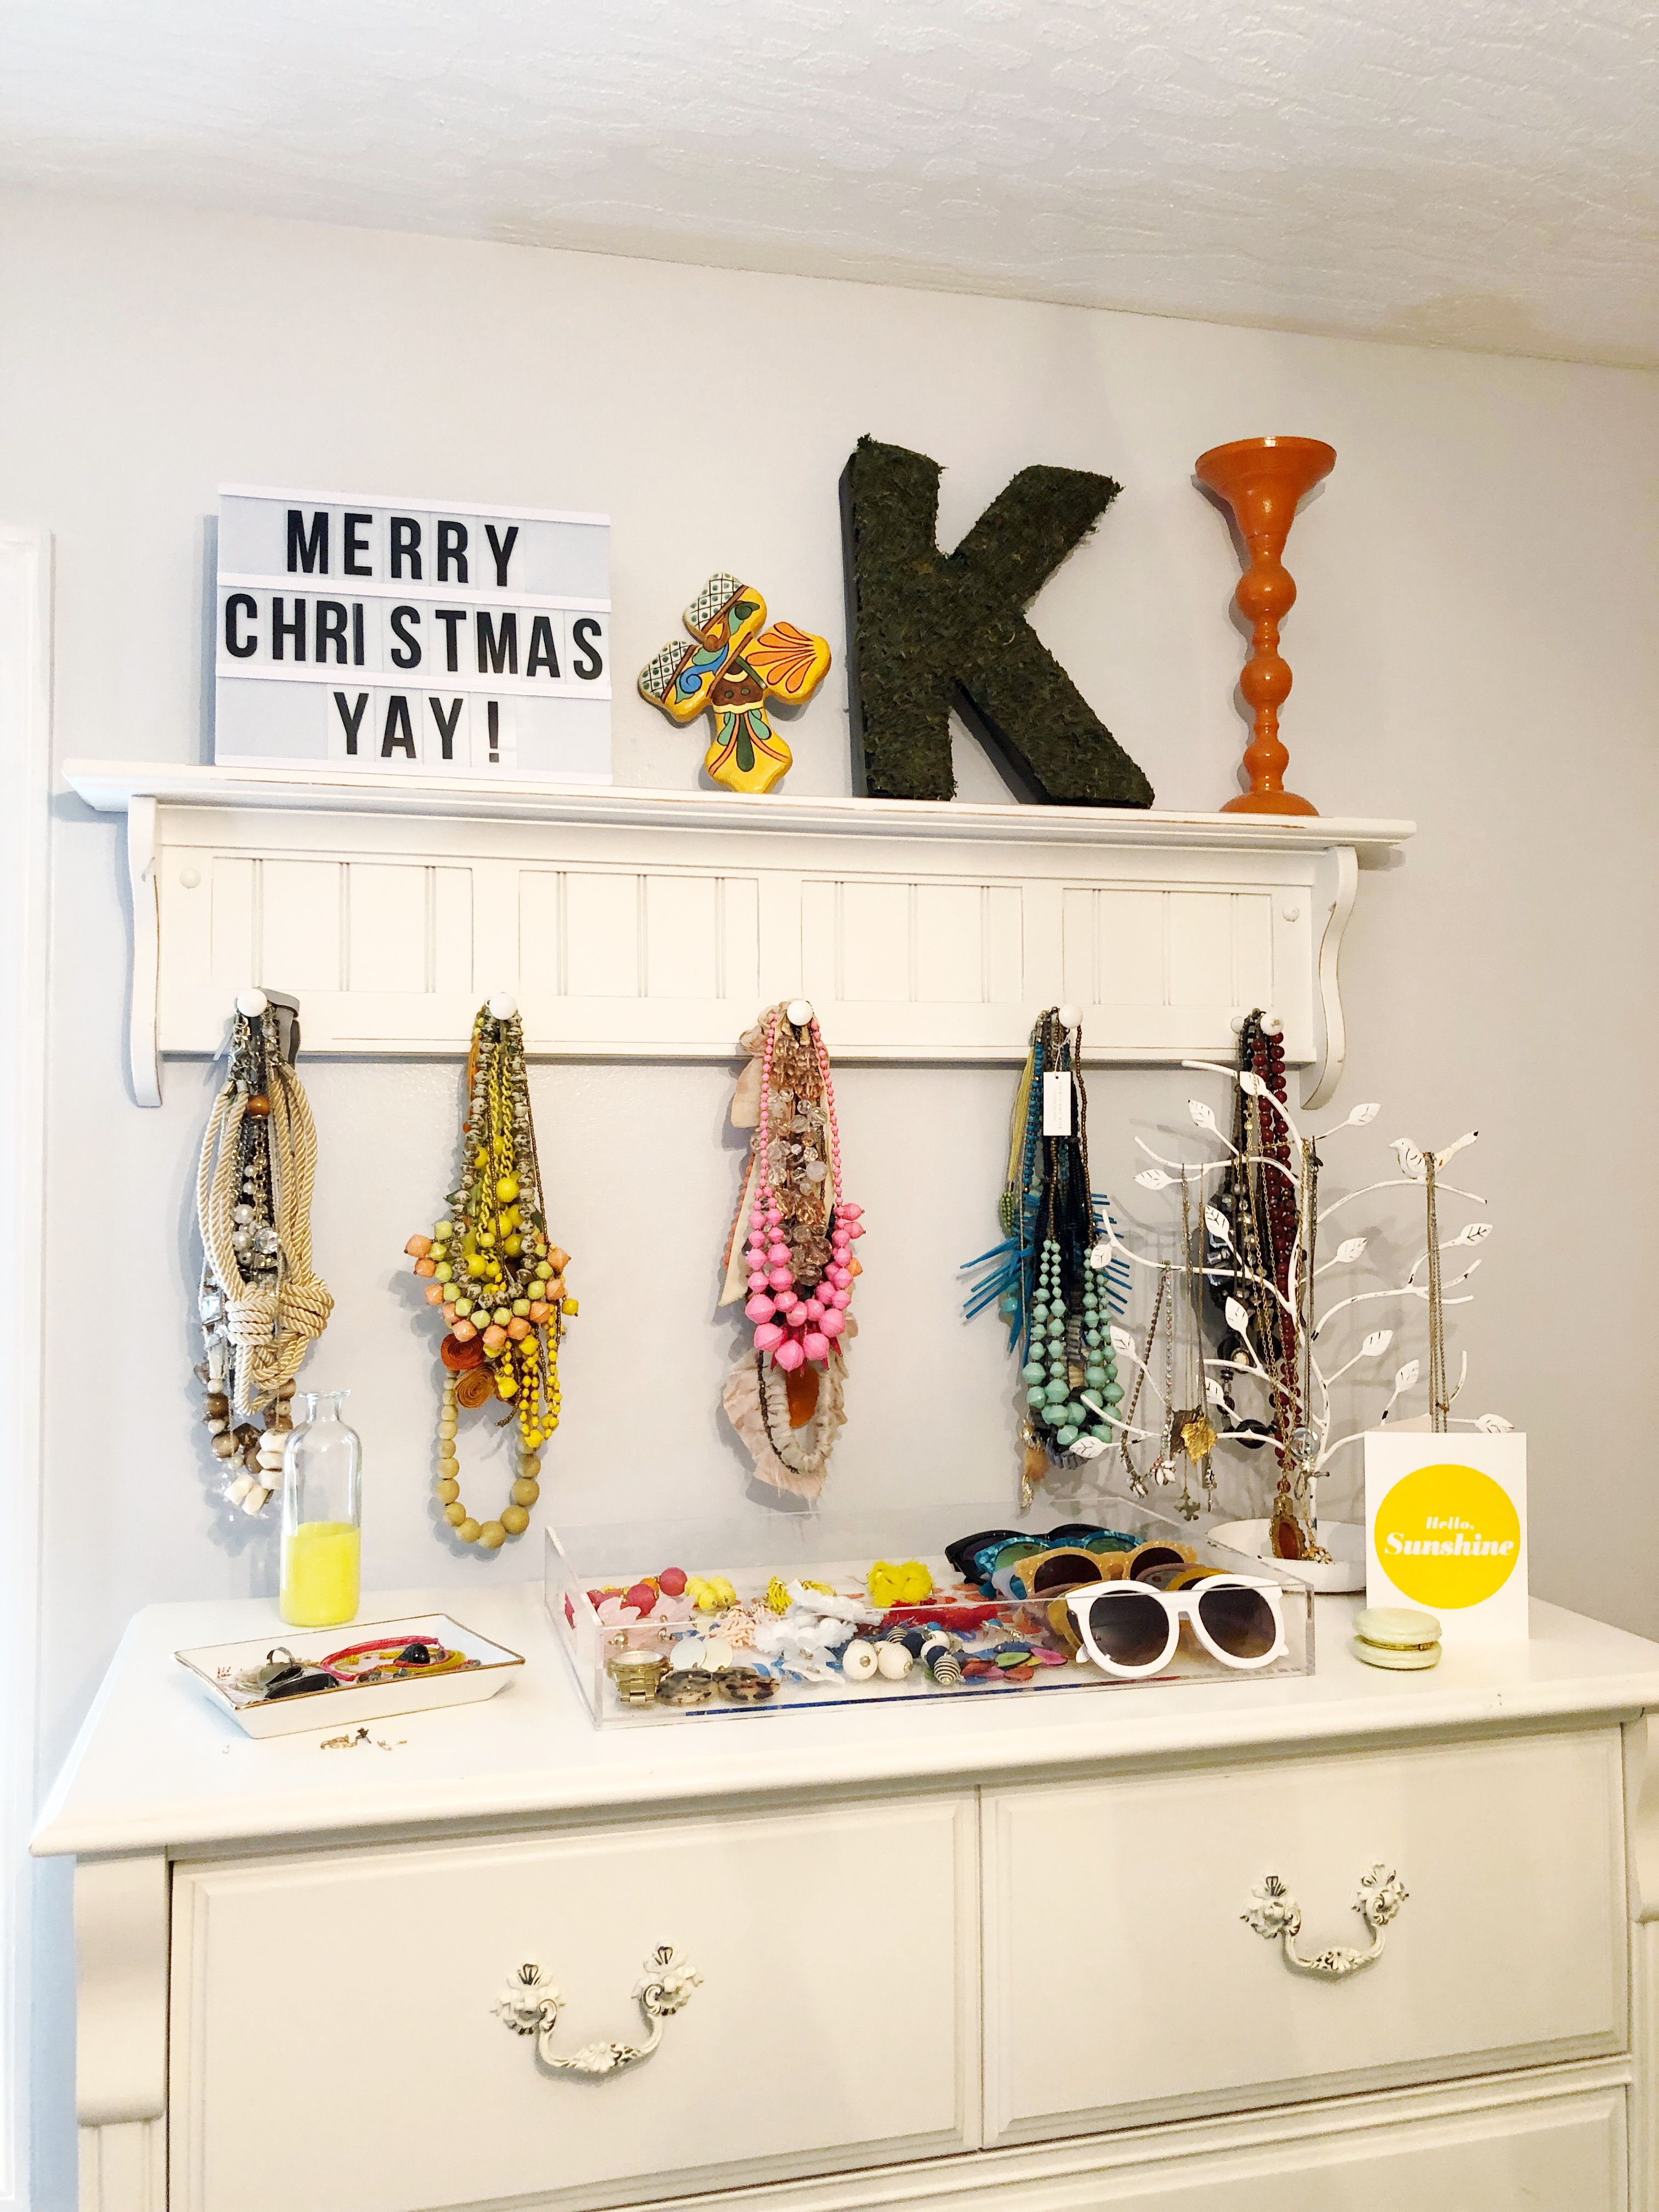 How I M Decorating My Room For Christmas Christmas Tree Themes